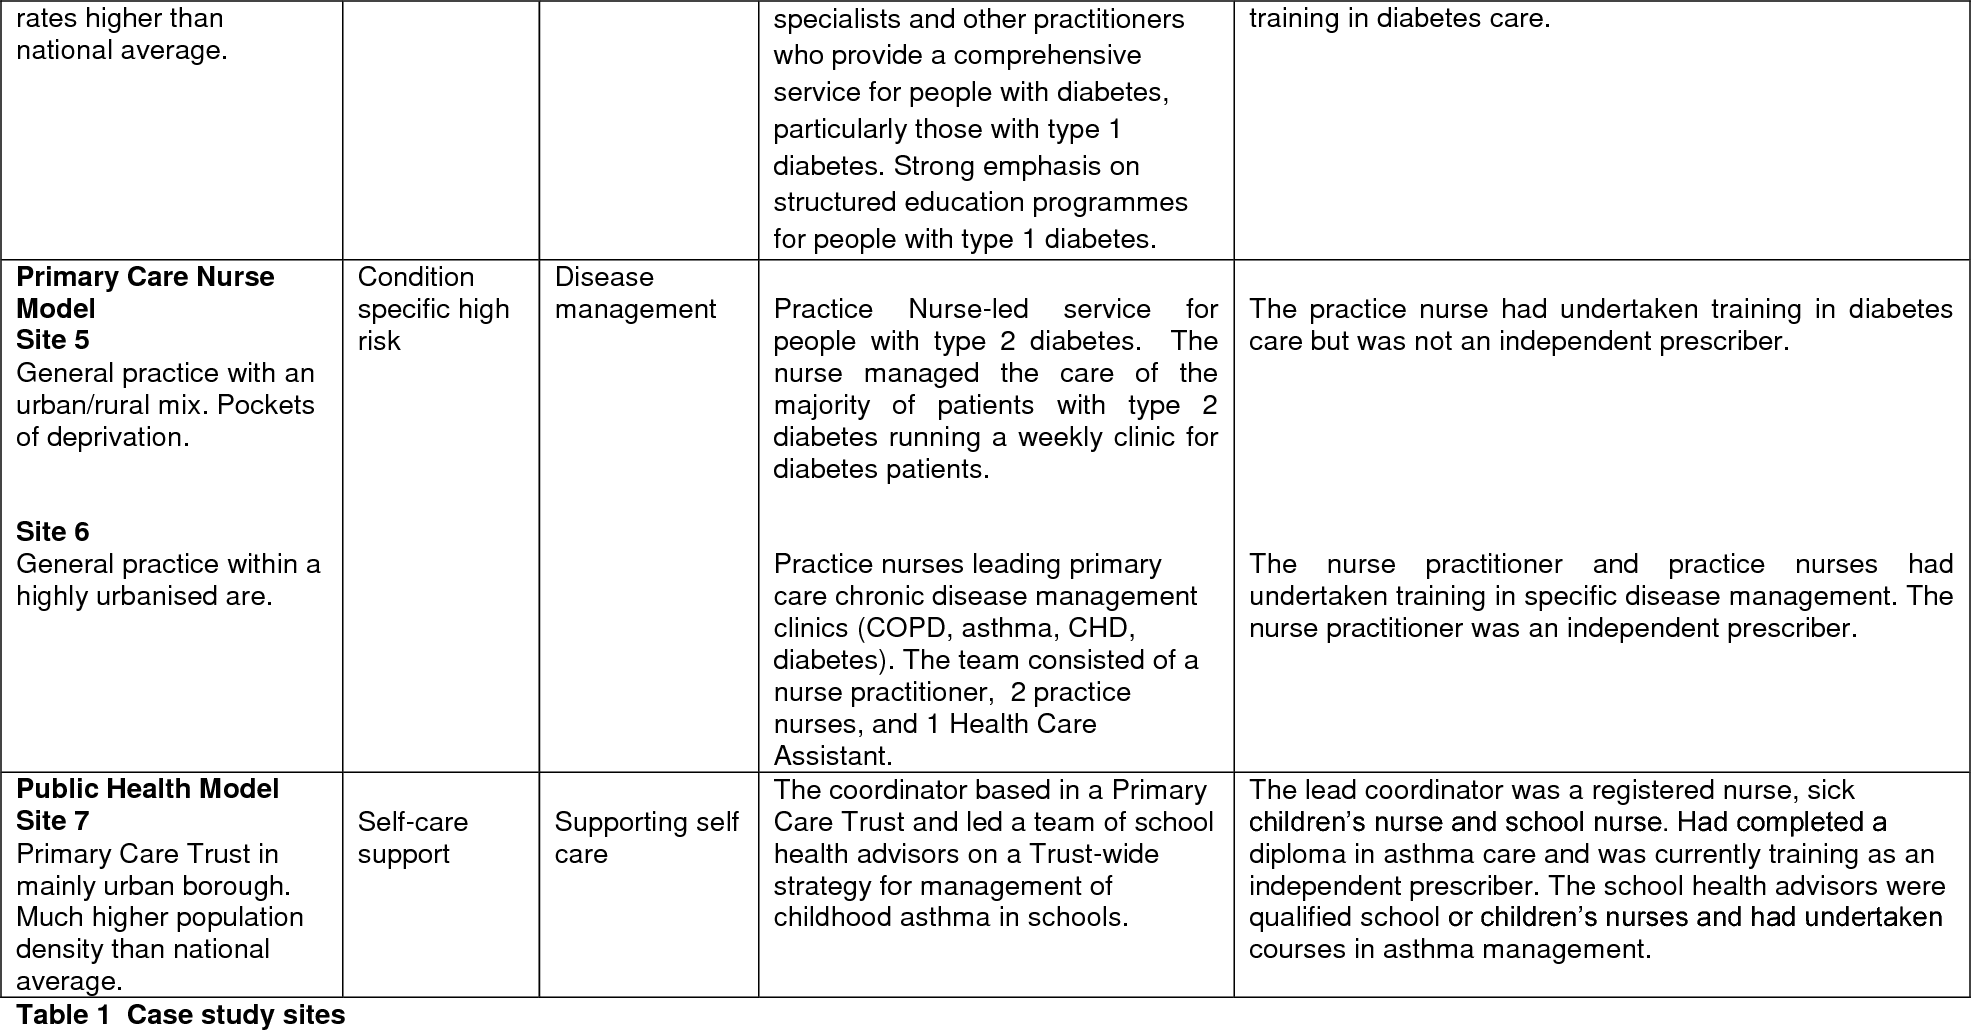 Asthma Diploma For Practice Nurses - Asthma Lung Disease